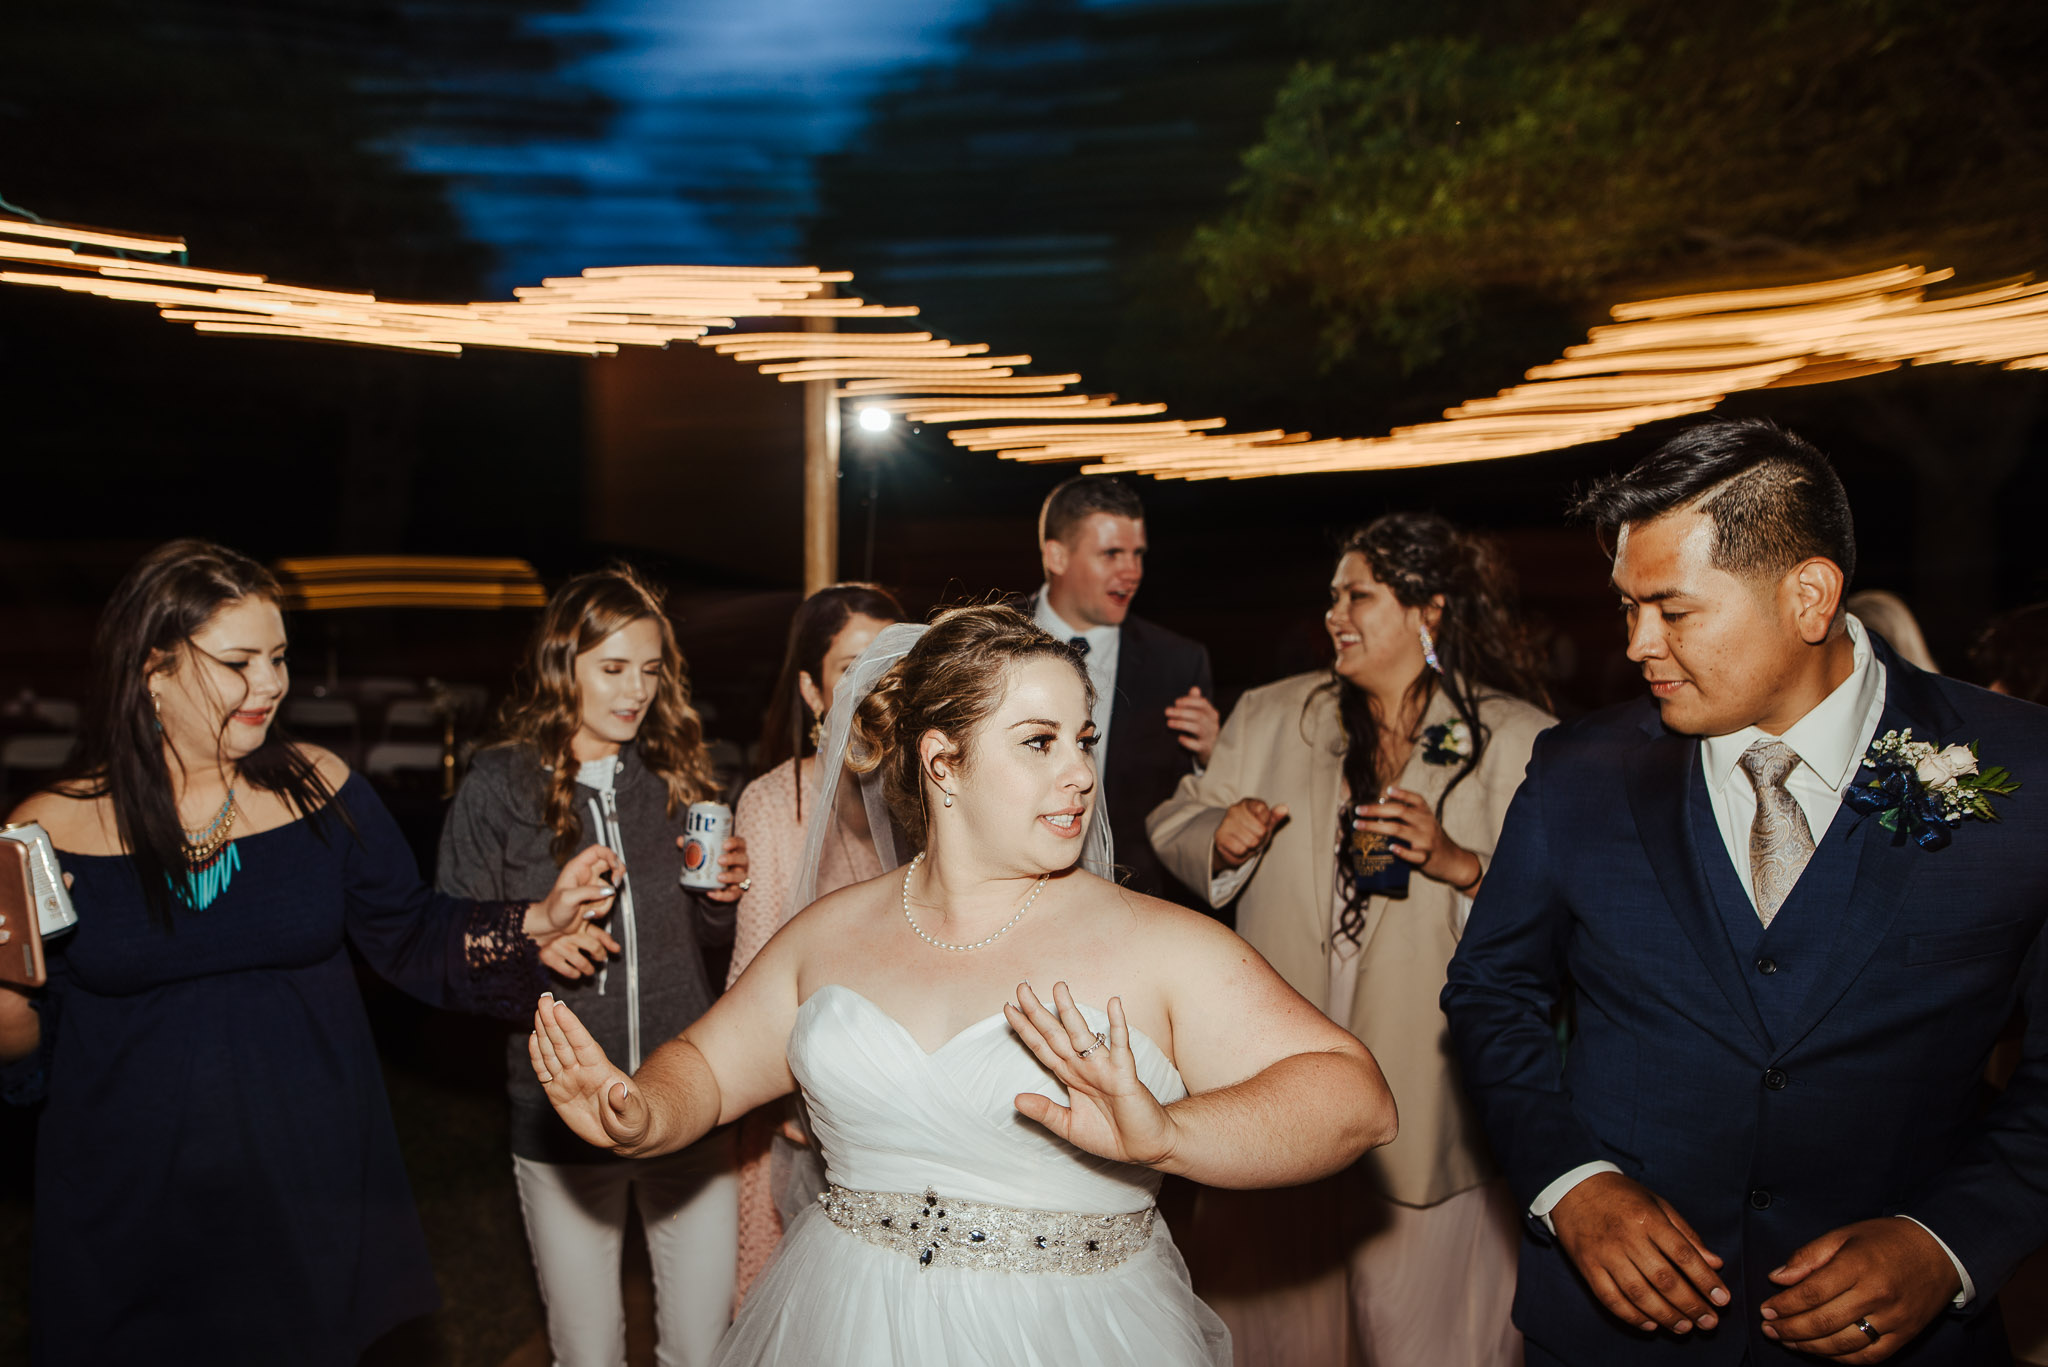 Christoval-Texas-Wedding_Photographer-Meghan&Tony-0035.jpg